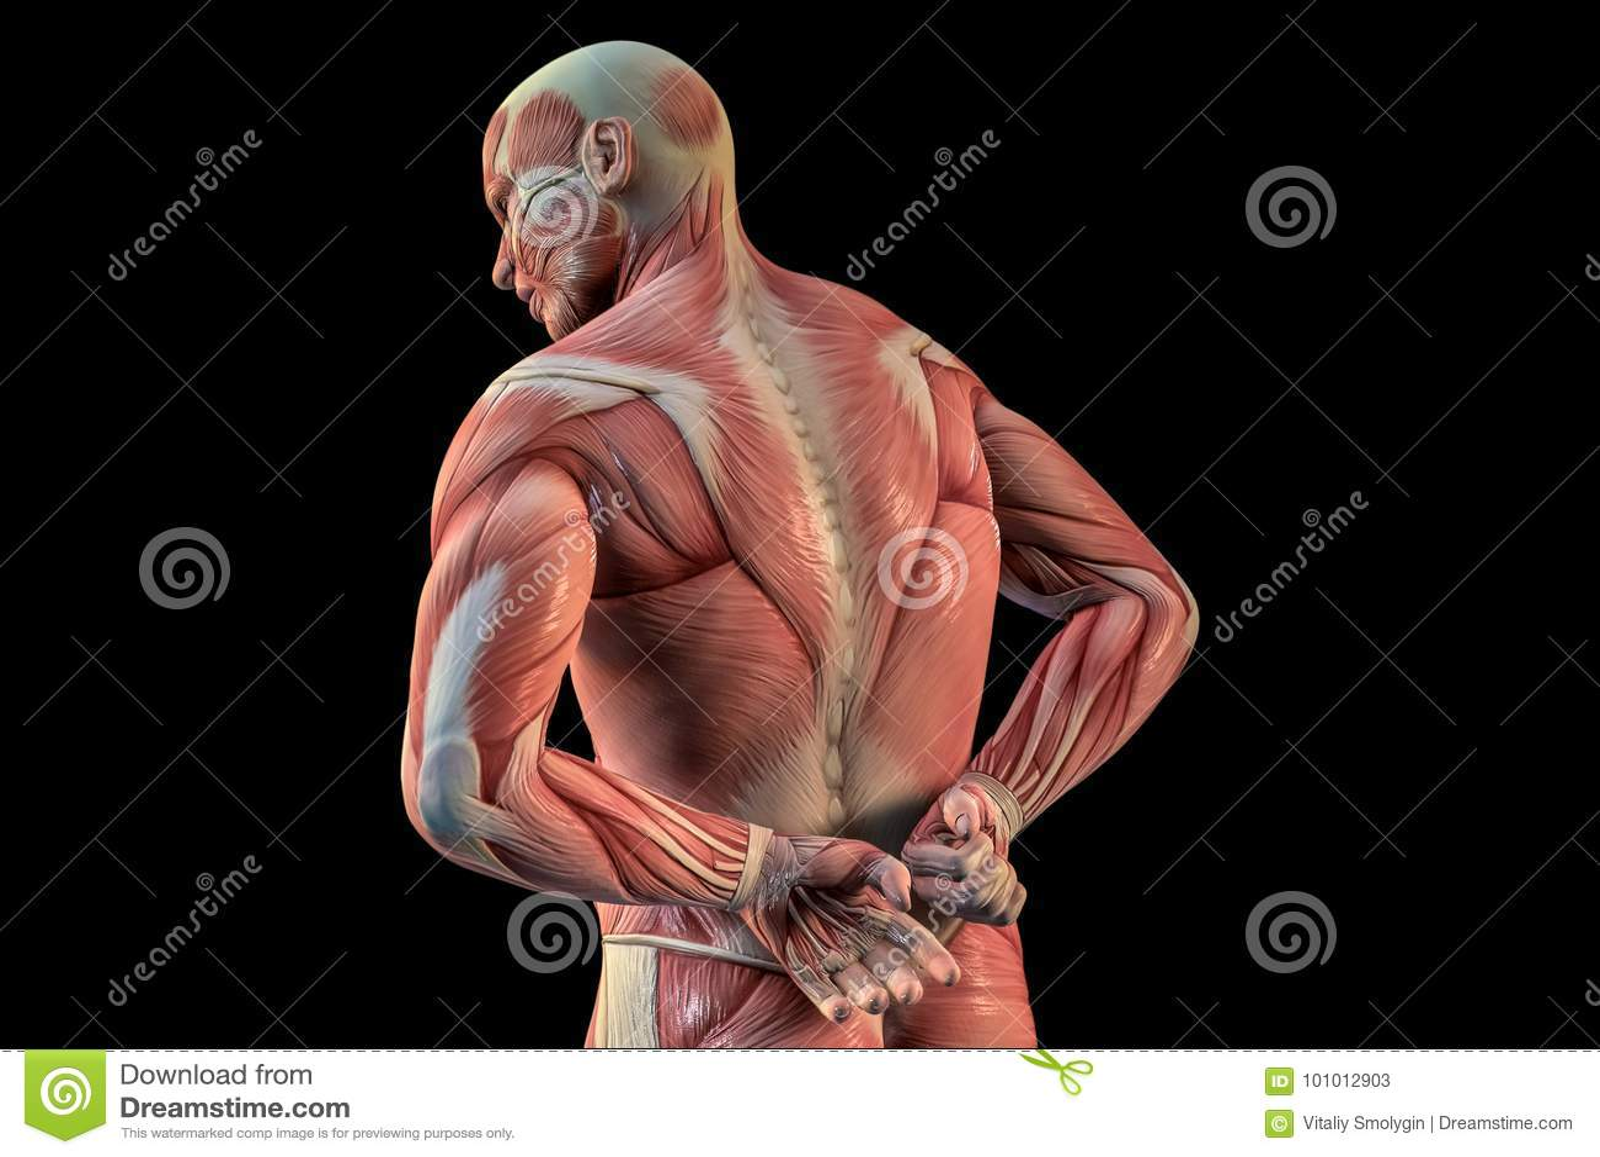 Human Anatomy Male Muscles 3d Illustration Stock Illustration